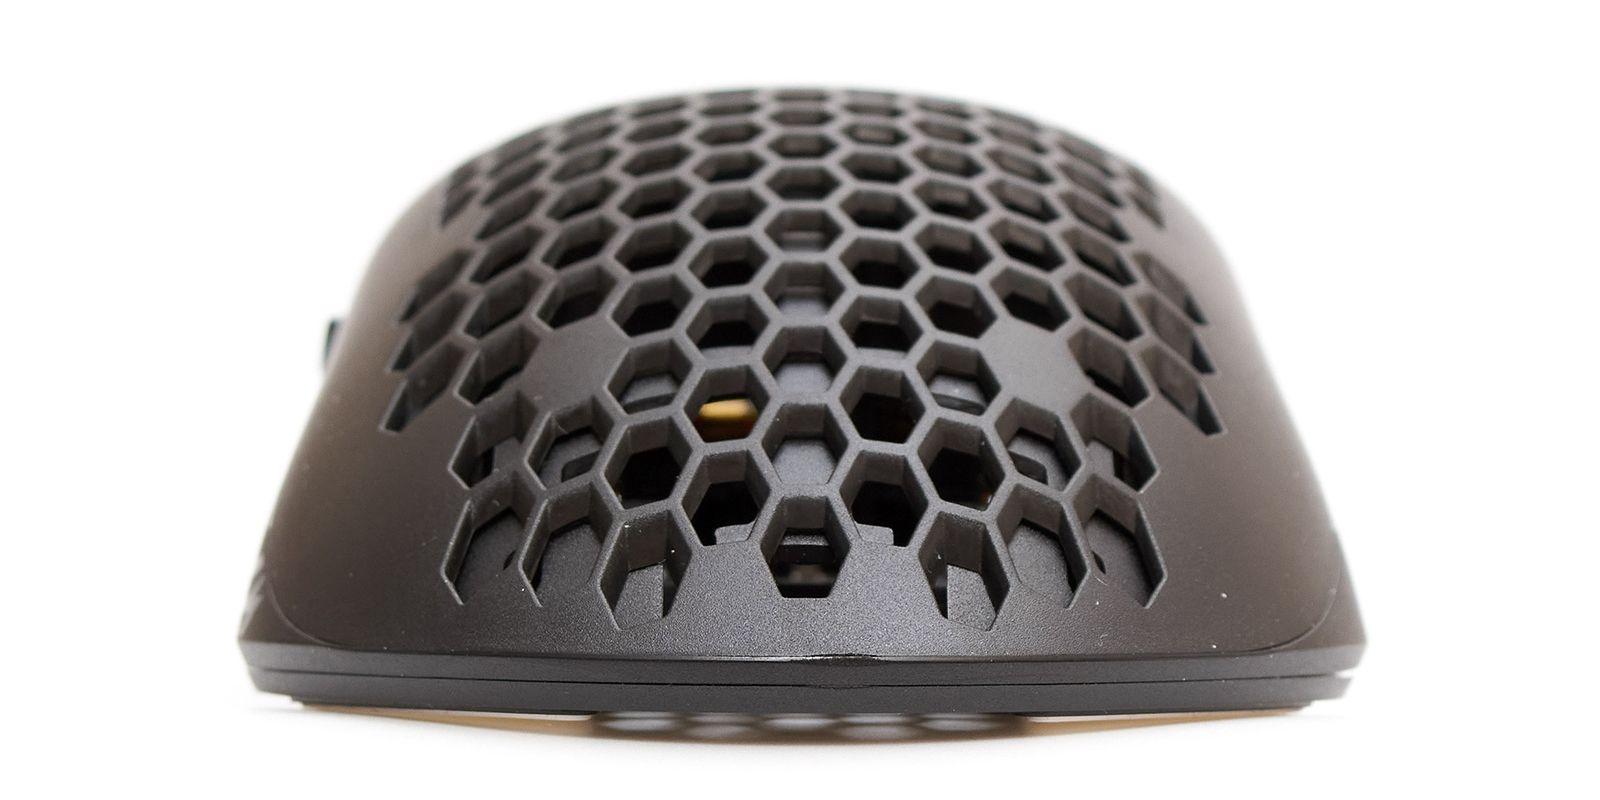 Мышь Glorious Model O Wireless. Фото 12